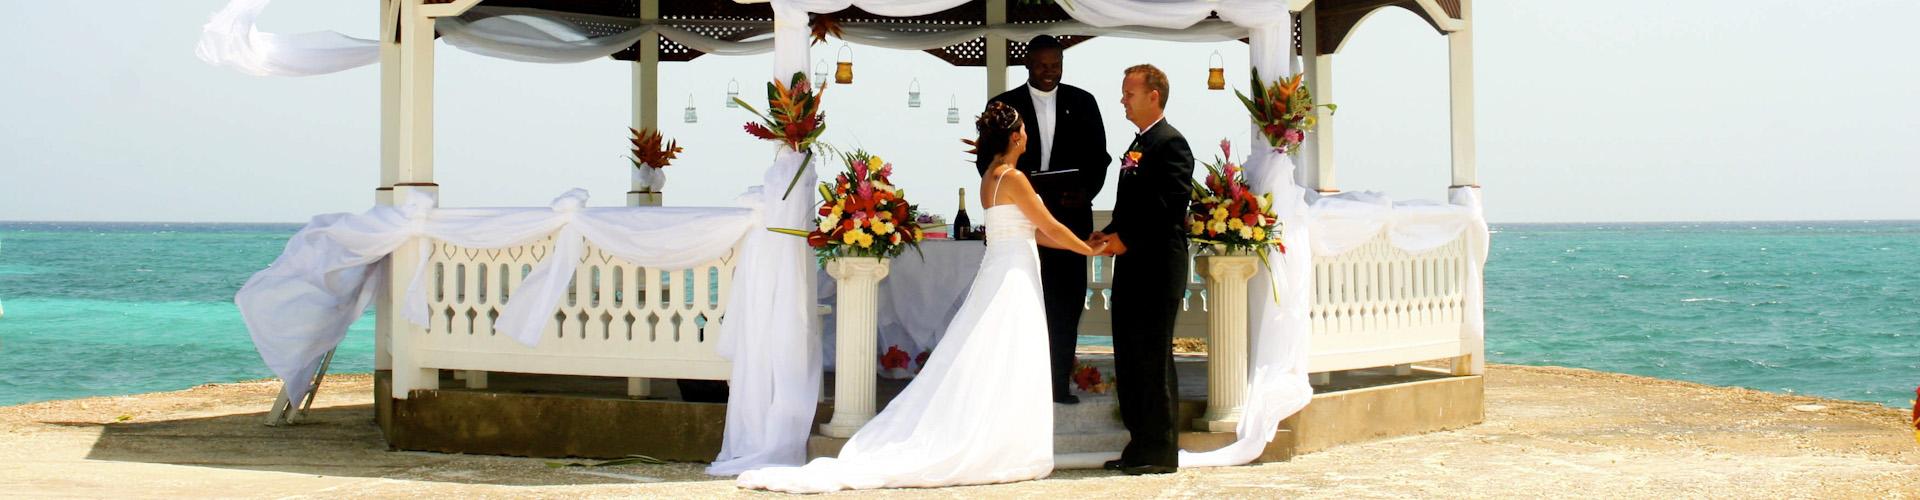 Top 5 Wedding Villas In Jamaica Blog